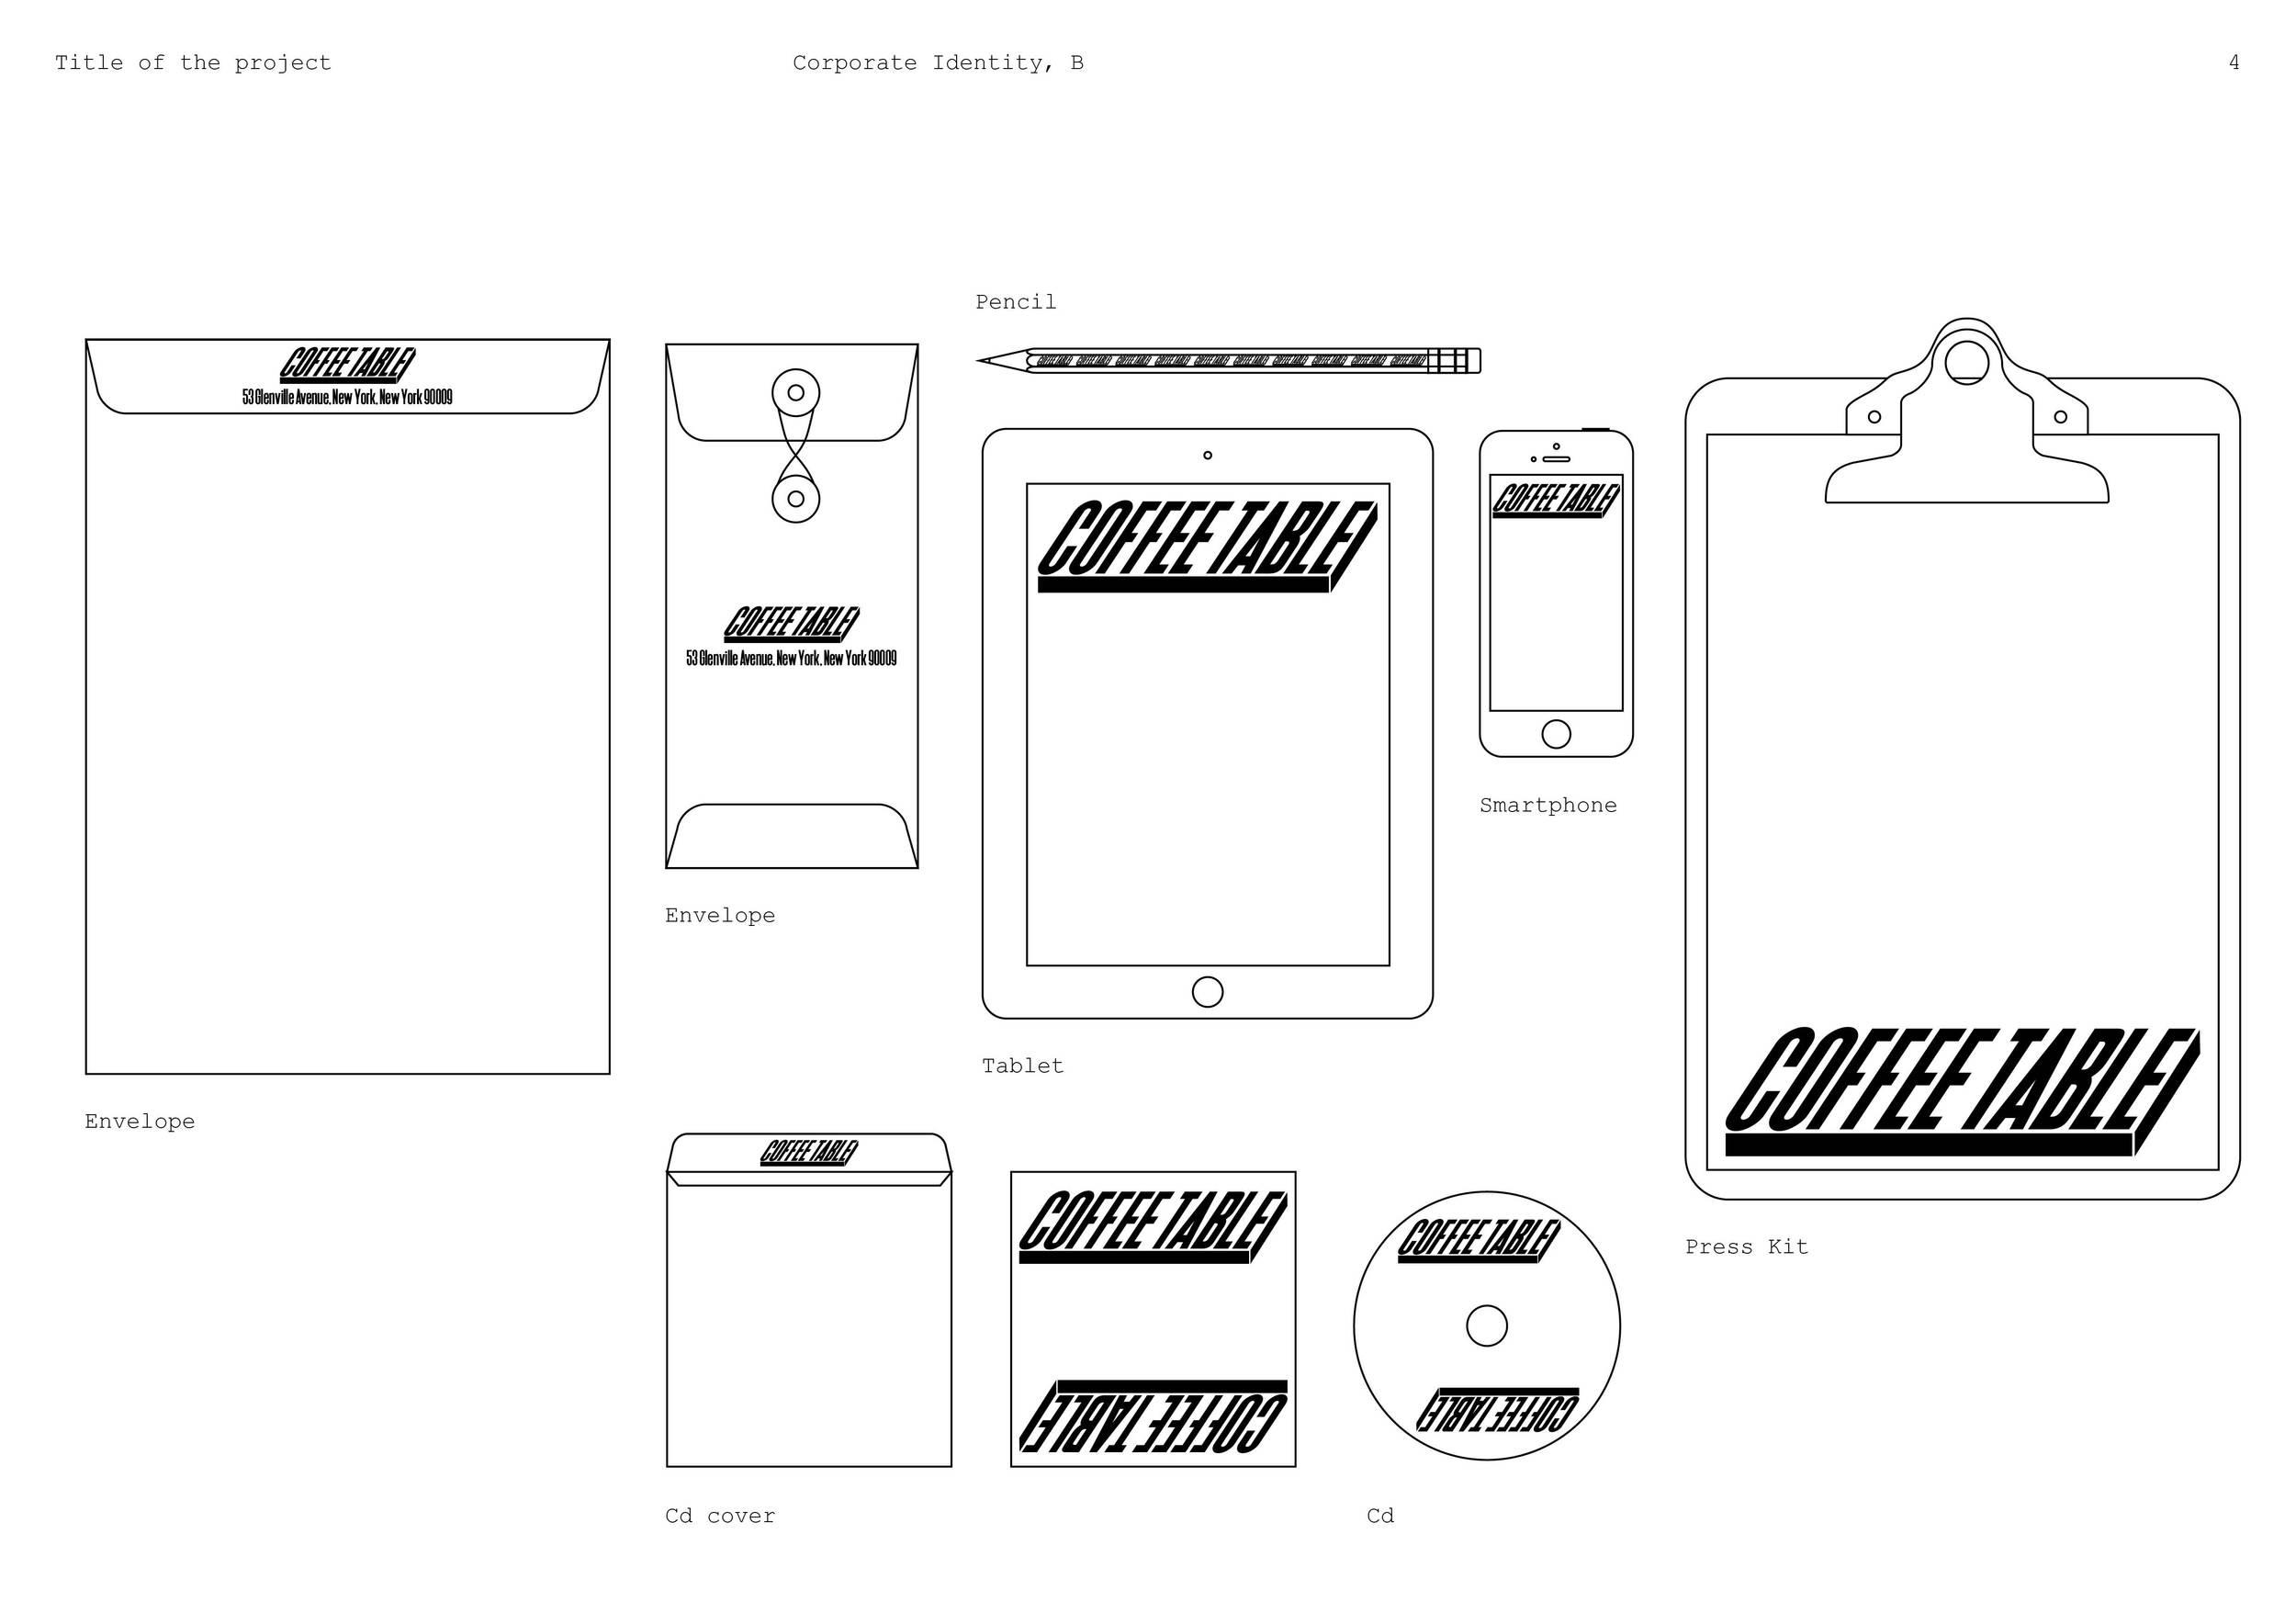 stationary layout-final4.jpg